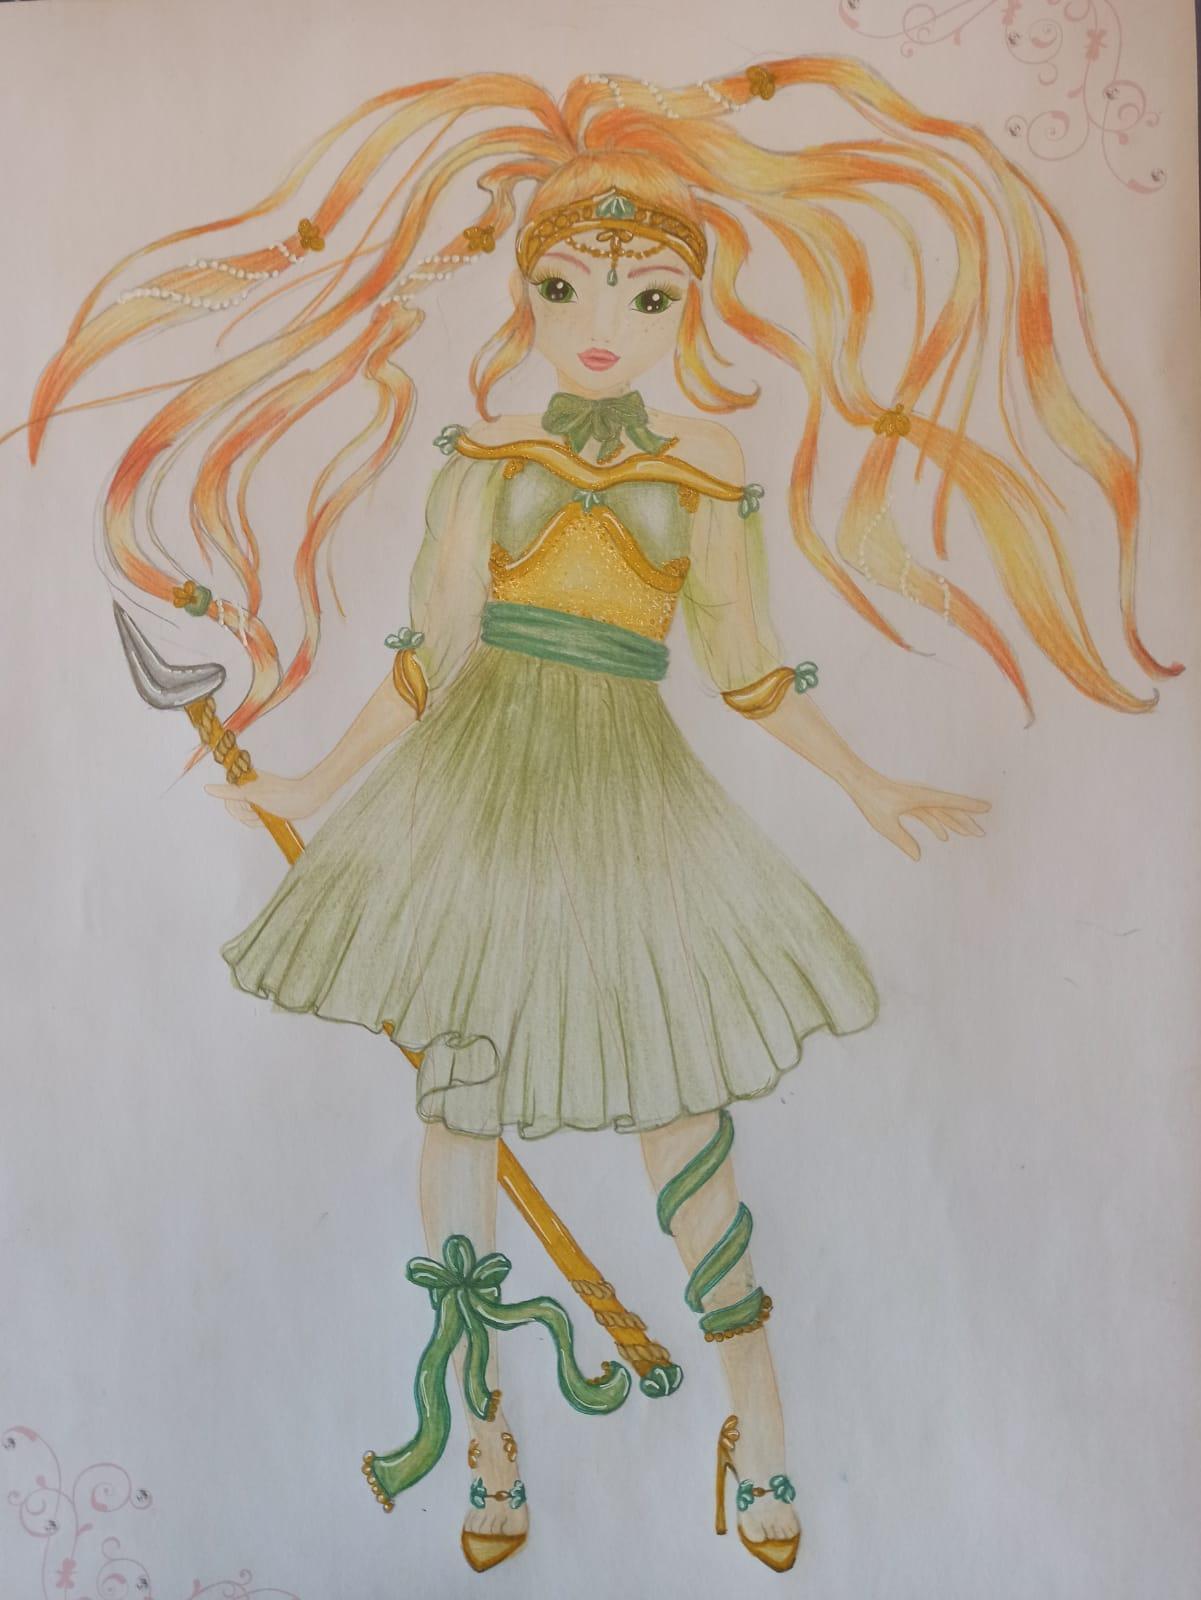 Rose S., 12 Jahre, aus Leipzig